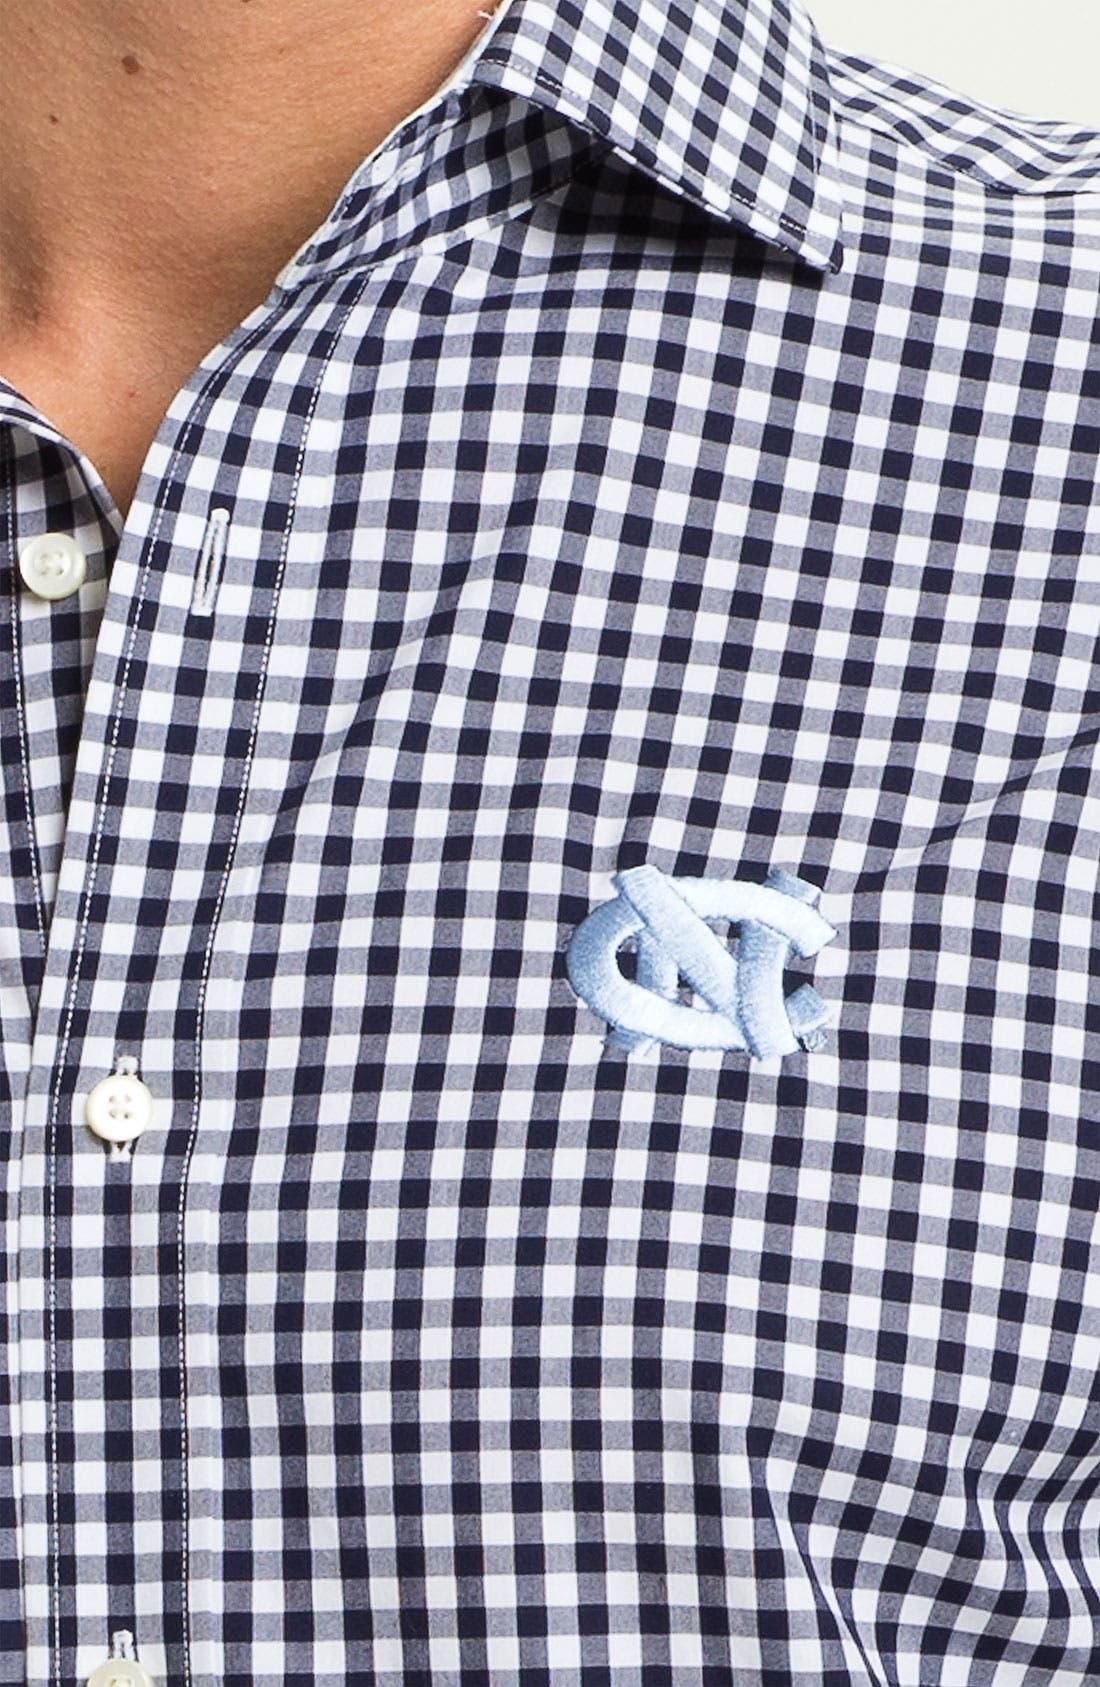 Alternate Image 3  - Thomas Dean 'University of North Carolina' Gingham Sport Shirt